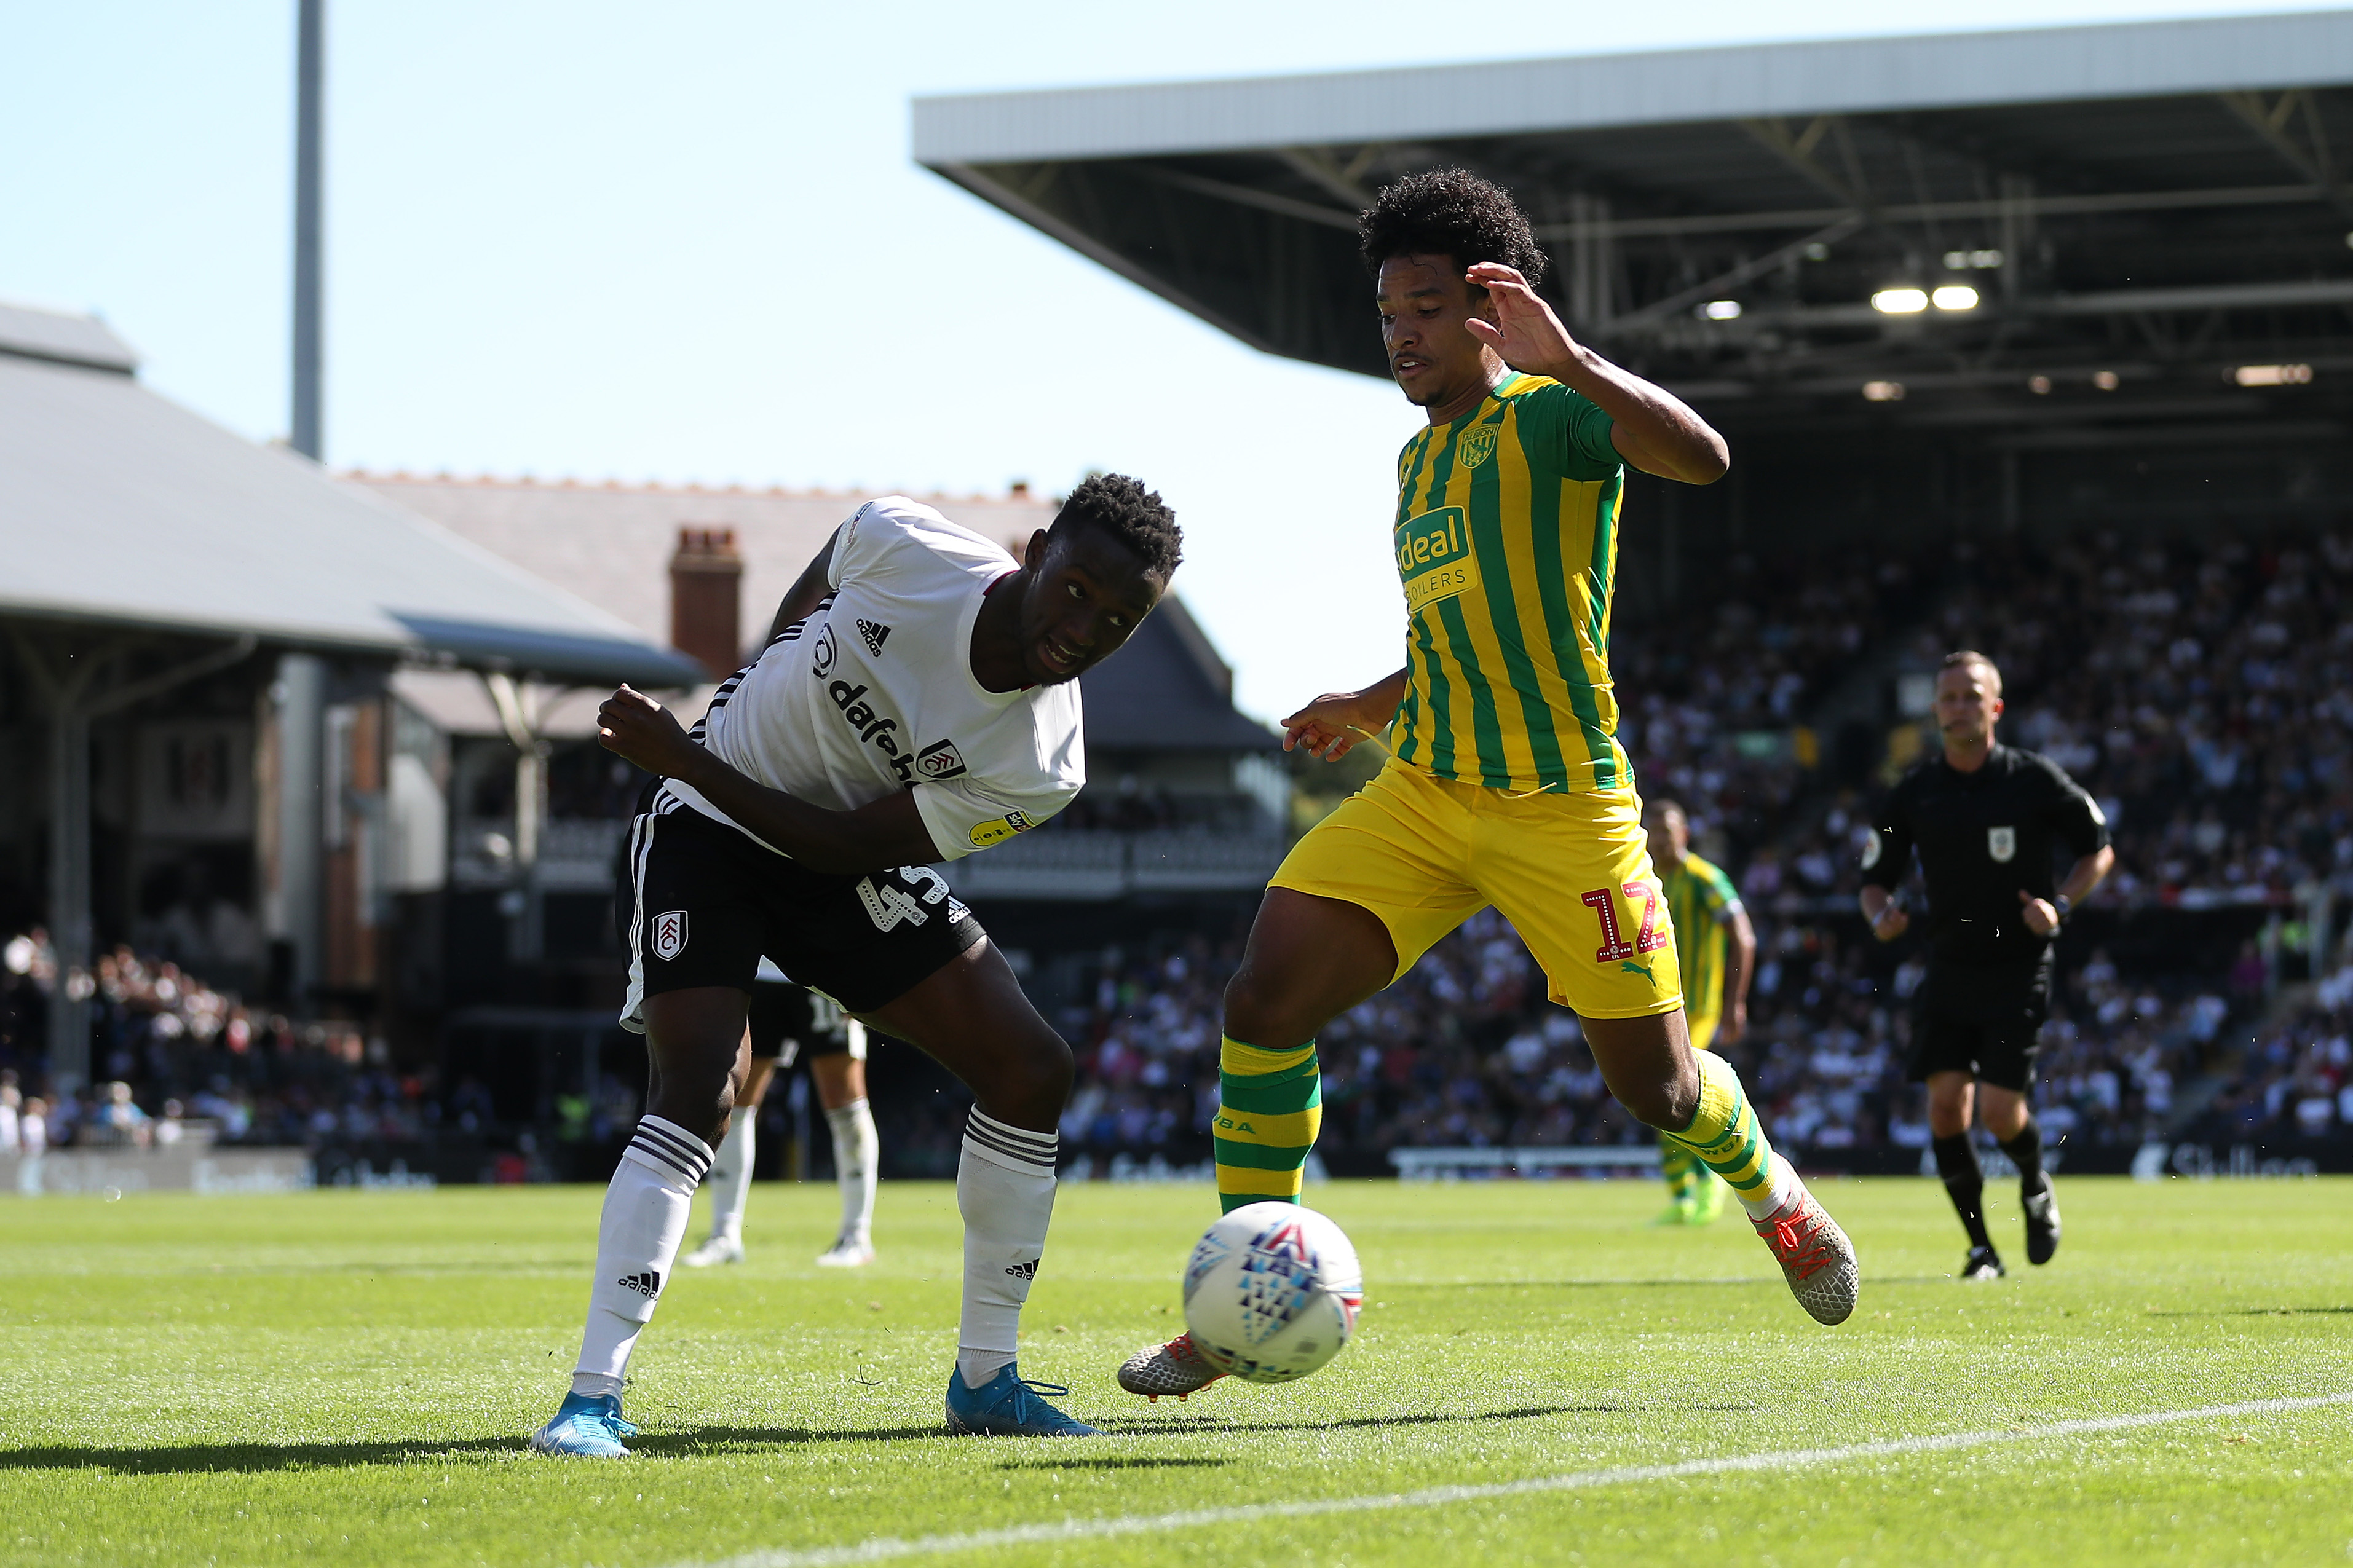 Cottage Talk Post Match Show: Fulham vs. West Brom